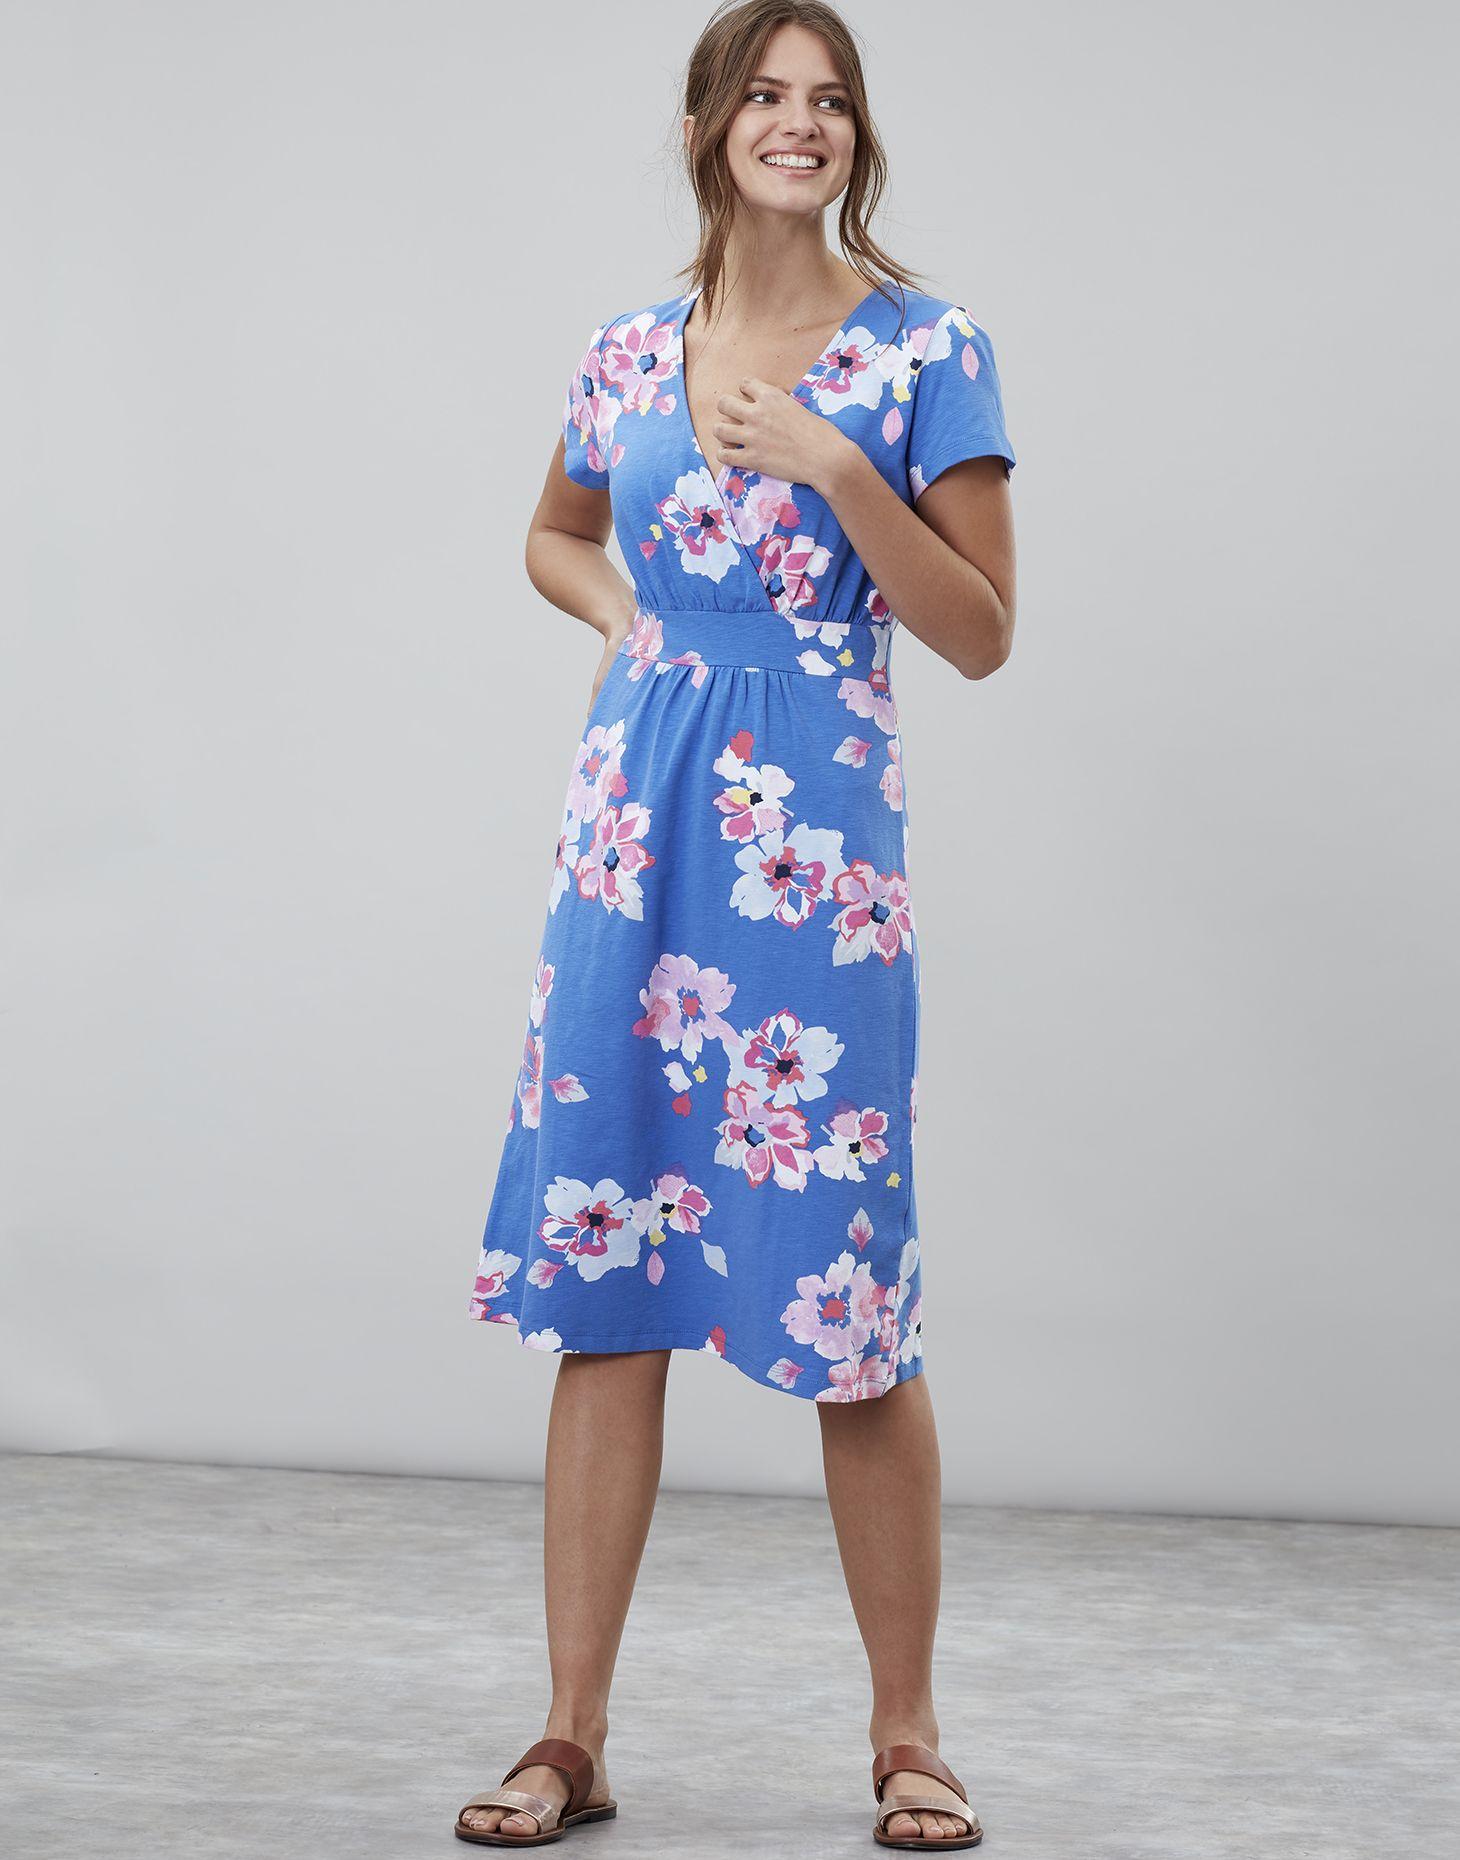 White Meadow Joules Jude Jersey Wrap Dress